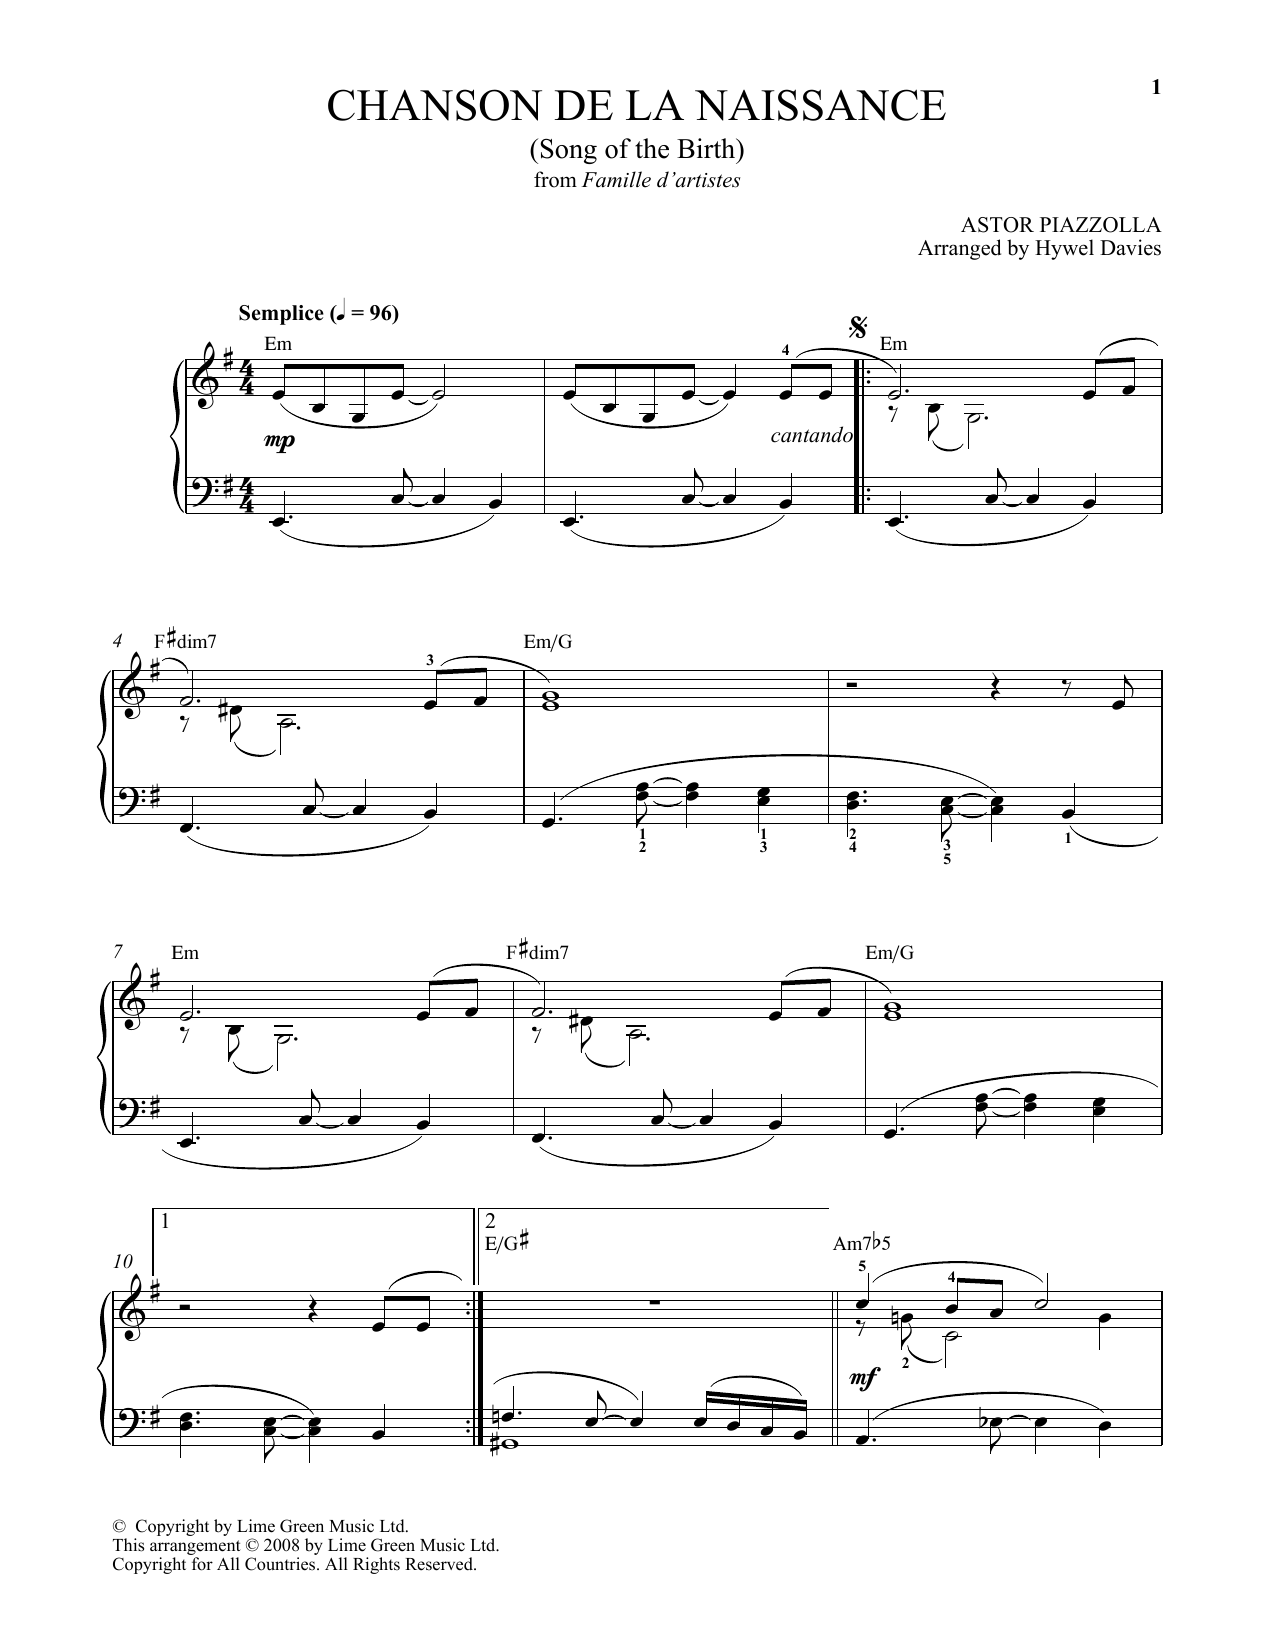 Astor Piazzolla Chanson De La Naissance sheet music notes and chords. Download Printable PDF.